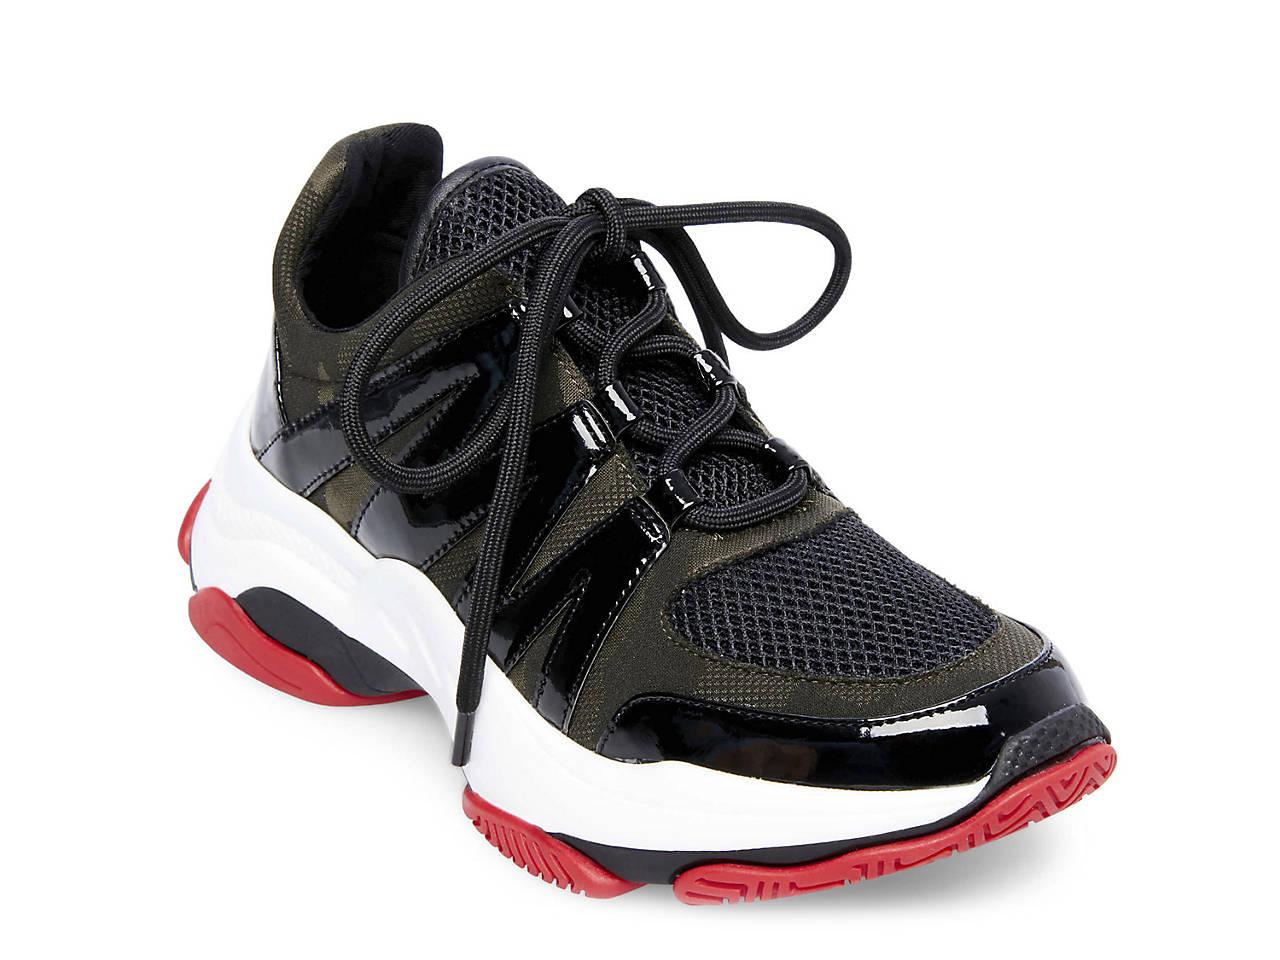 af6ba6ab1e9 Steve Madden Maximus Sneaker Women s Shoes